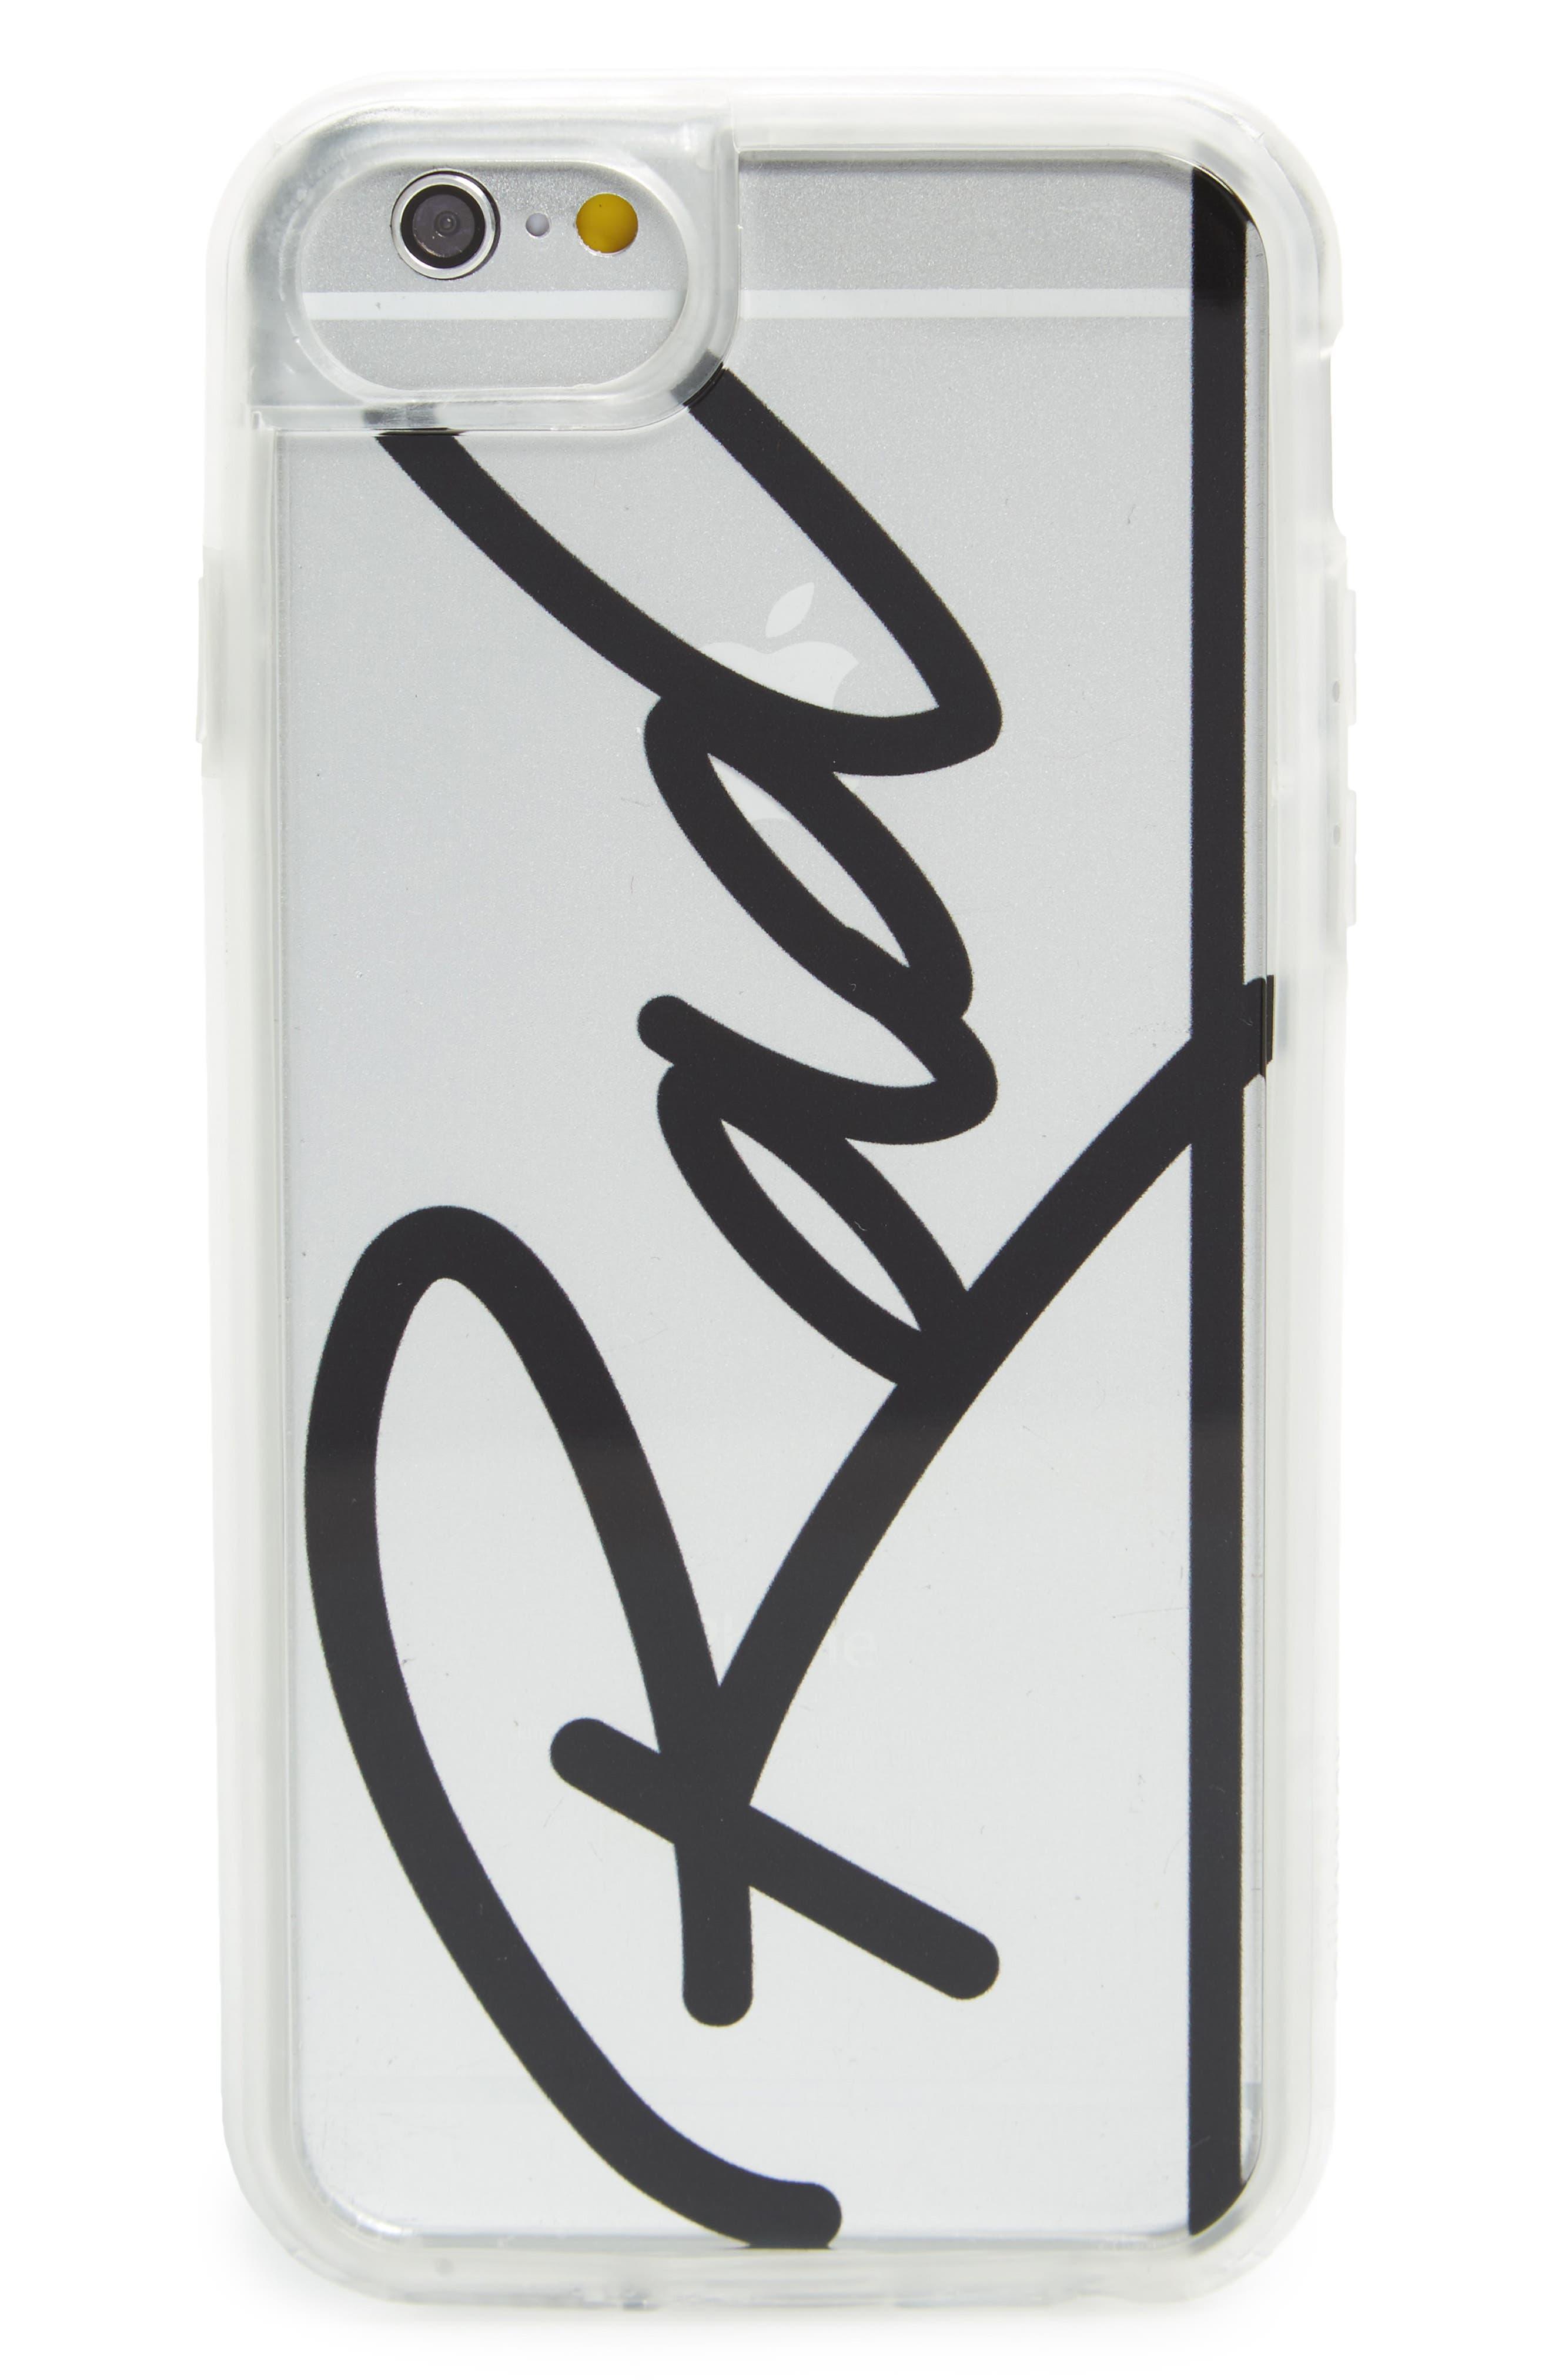 Main Image - MILKYWAY Rad iPhone 6/6s/7 Case